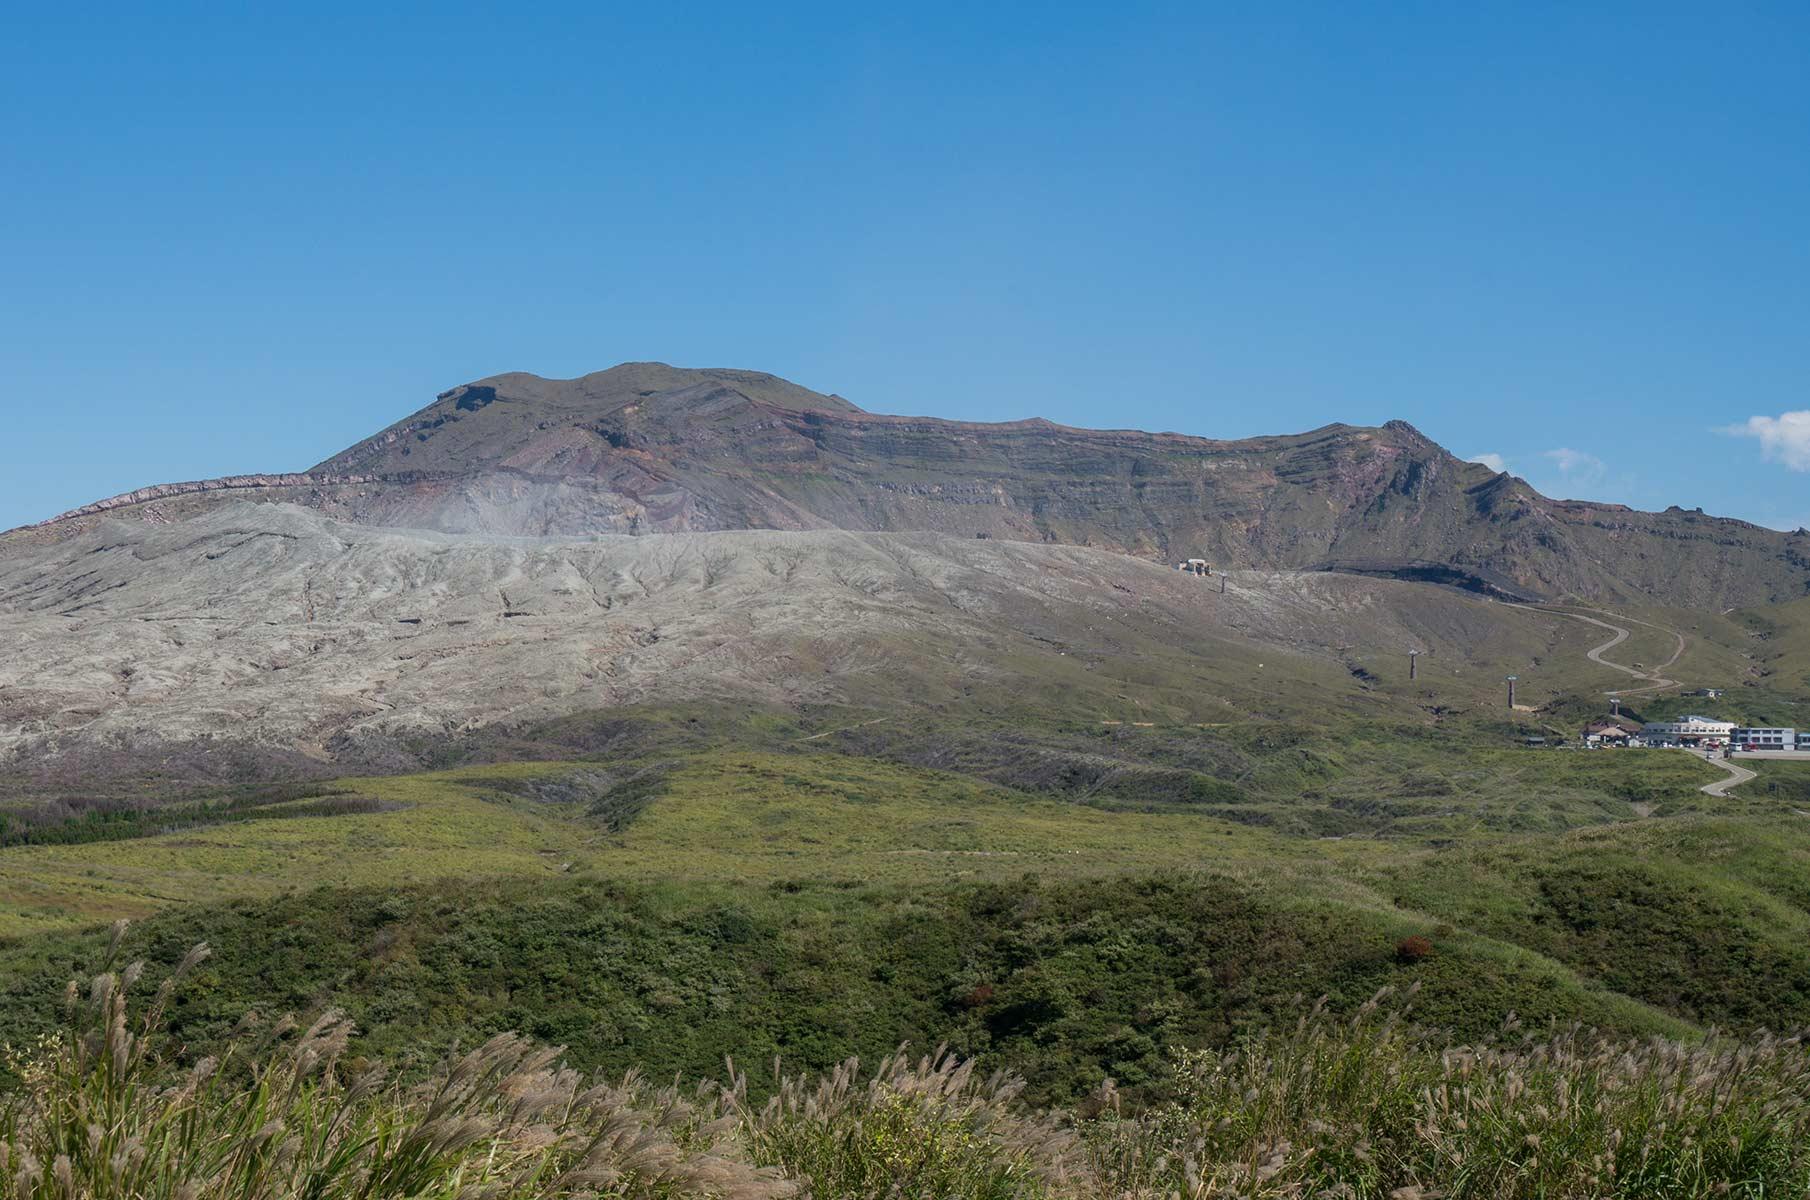 Blick auf den Mt. Aso, Japan